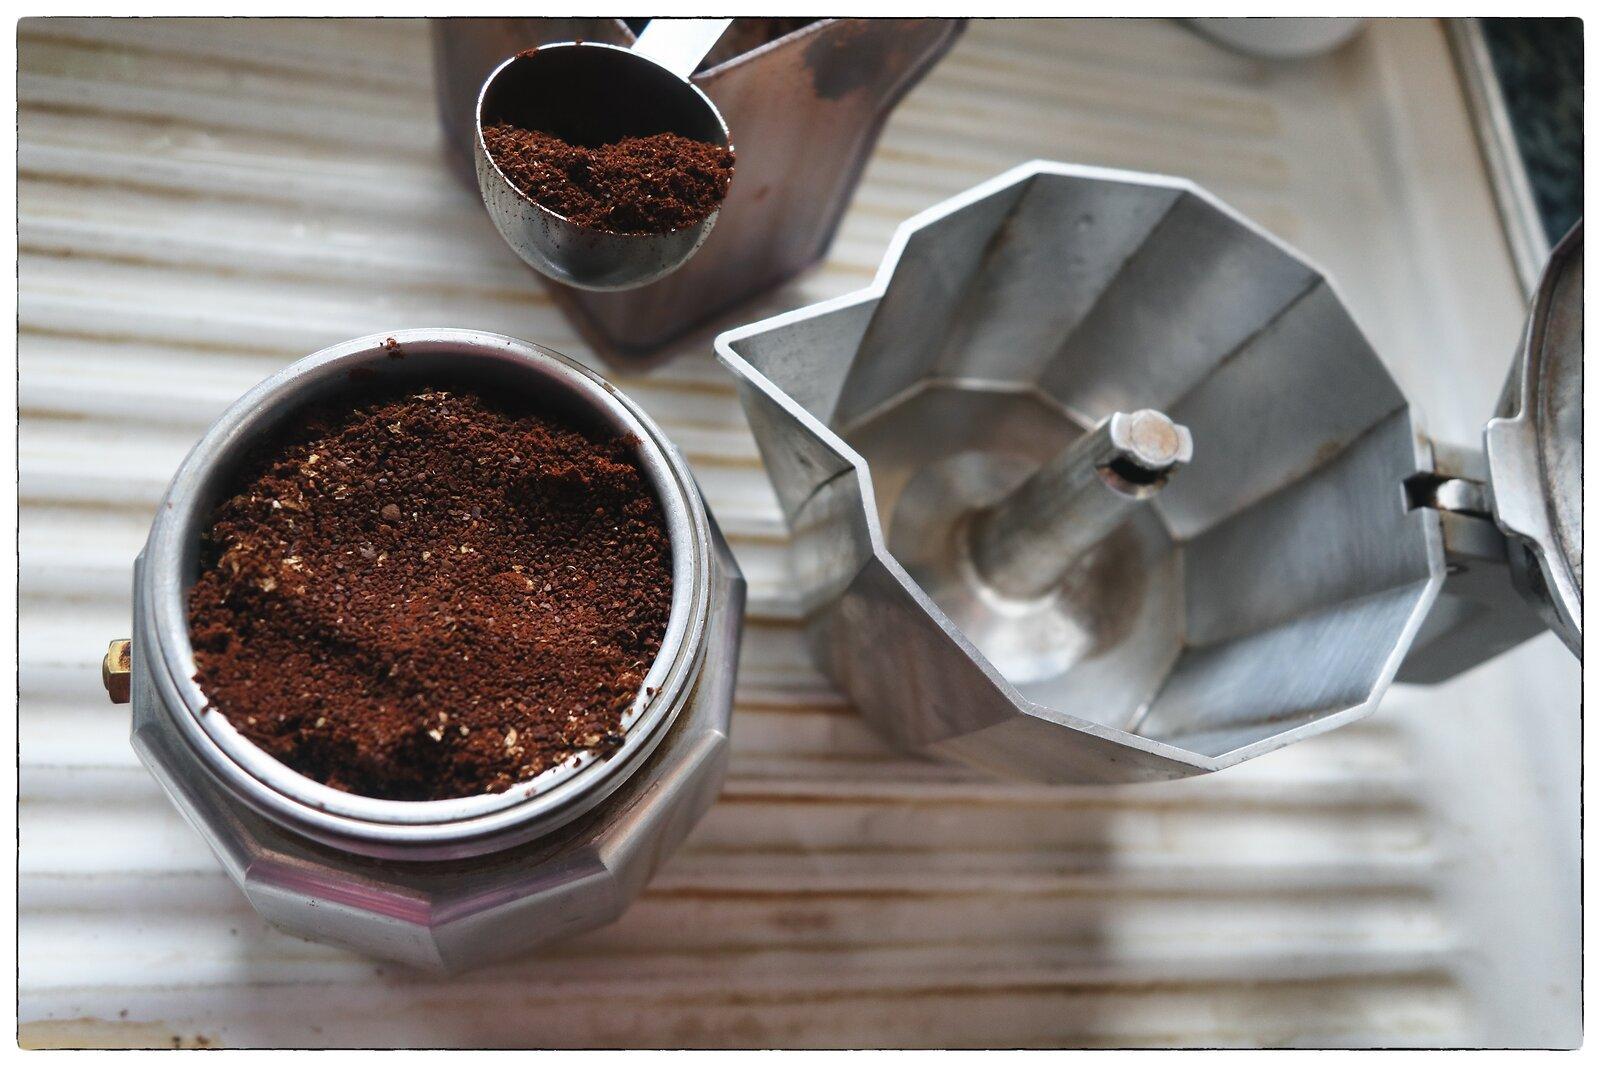 G1x_Jan27_21_Preparing_espresso.jpg